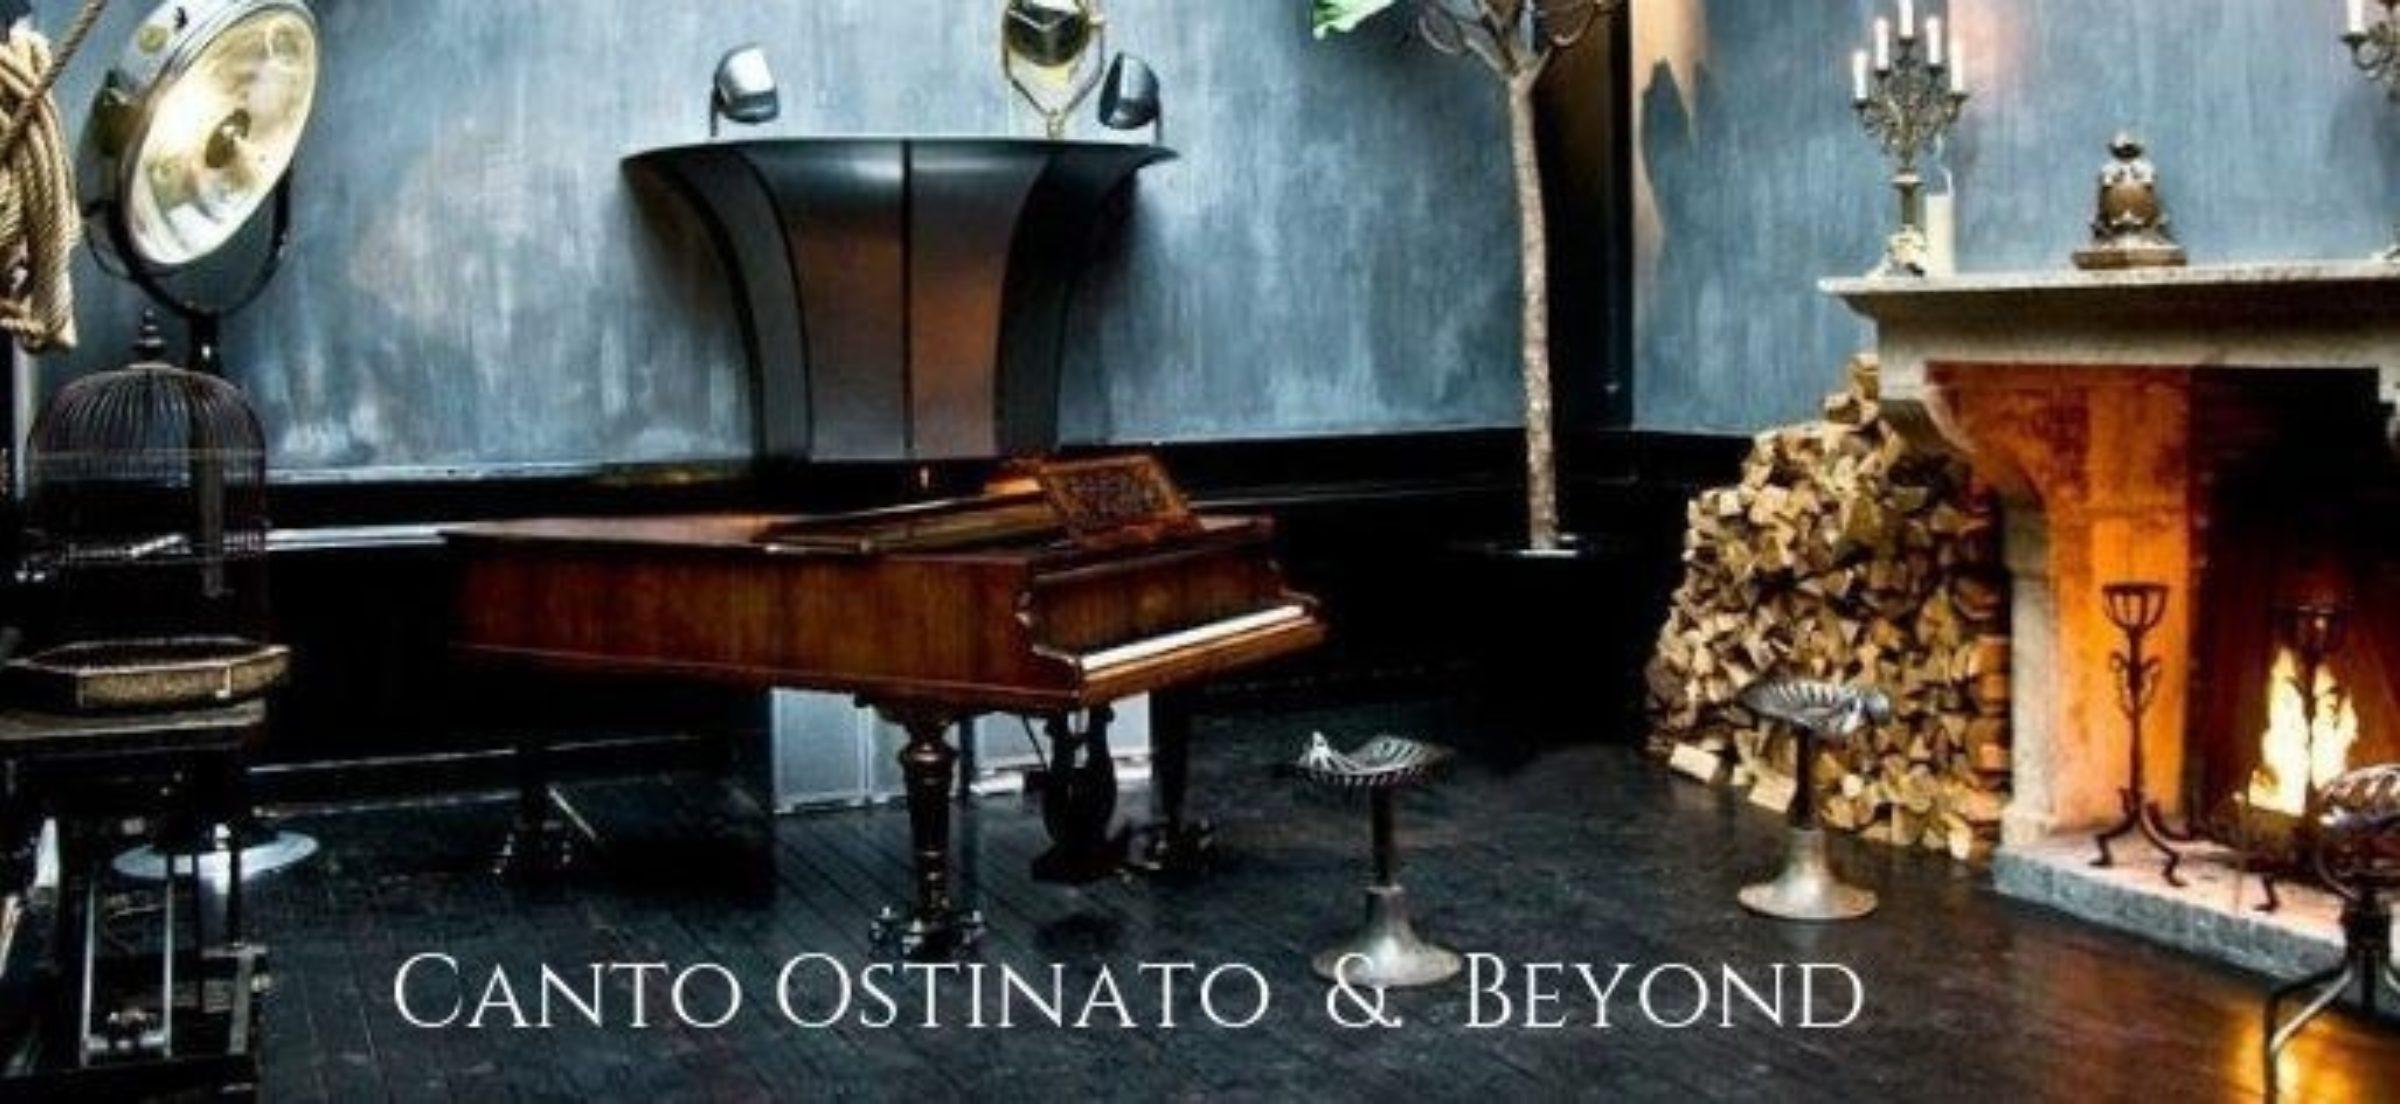 Canto Ostinato and Beyond ligconcert 2696 1554730421 35hxfxxybi